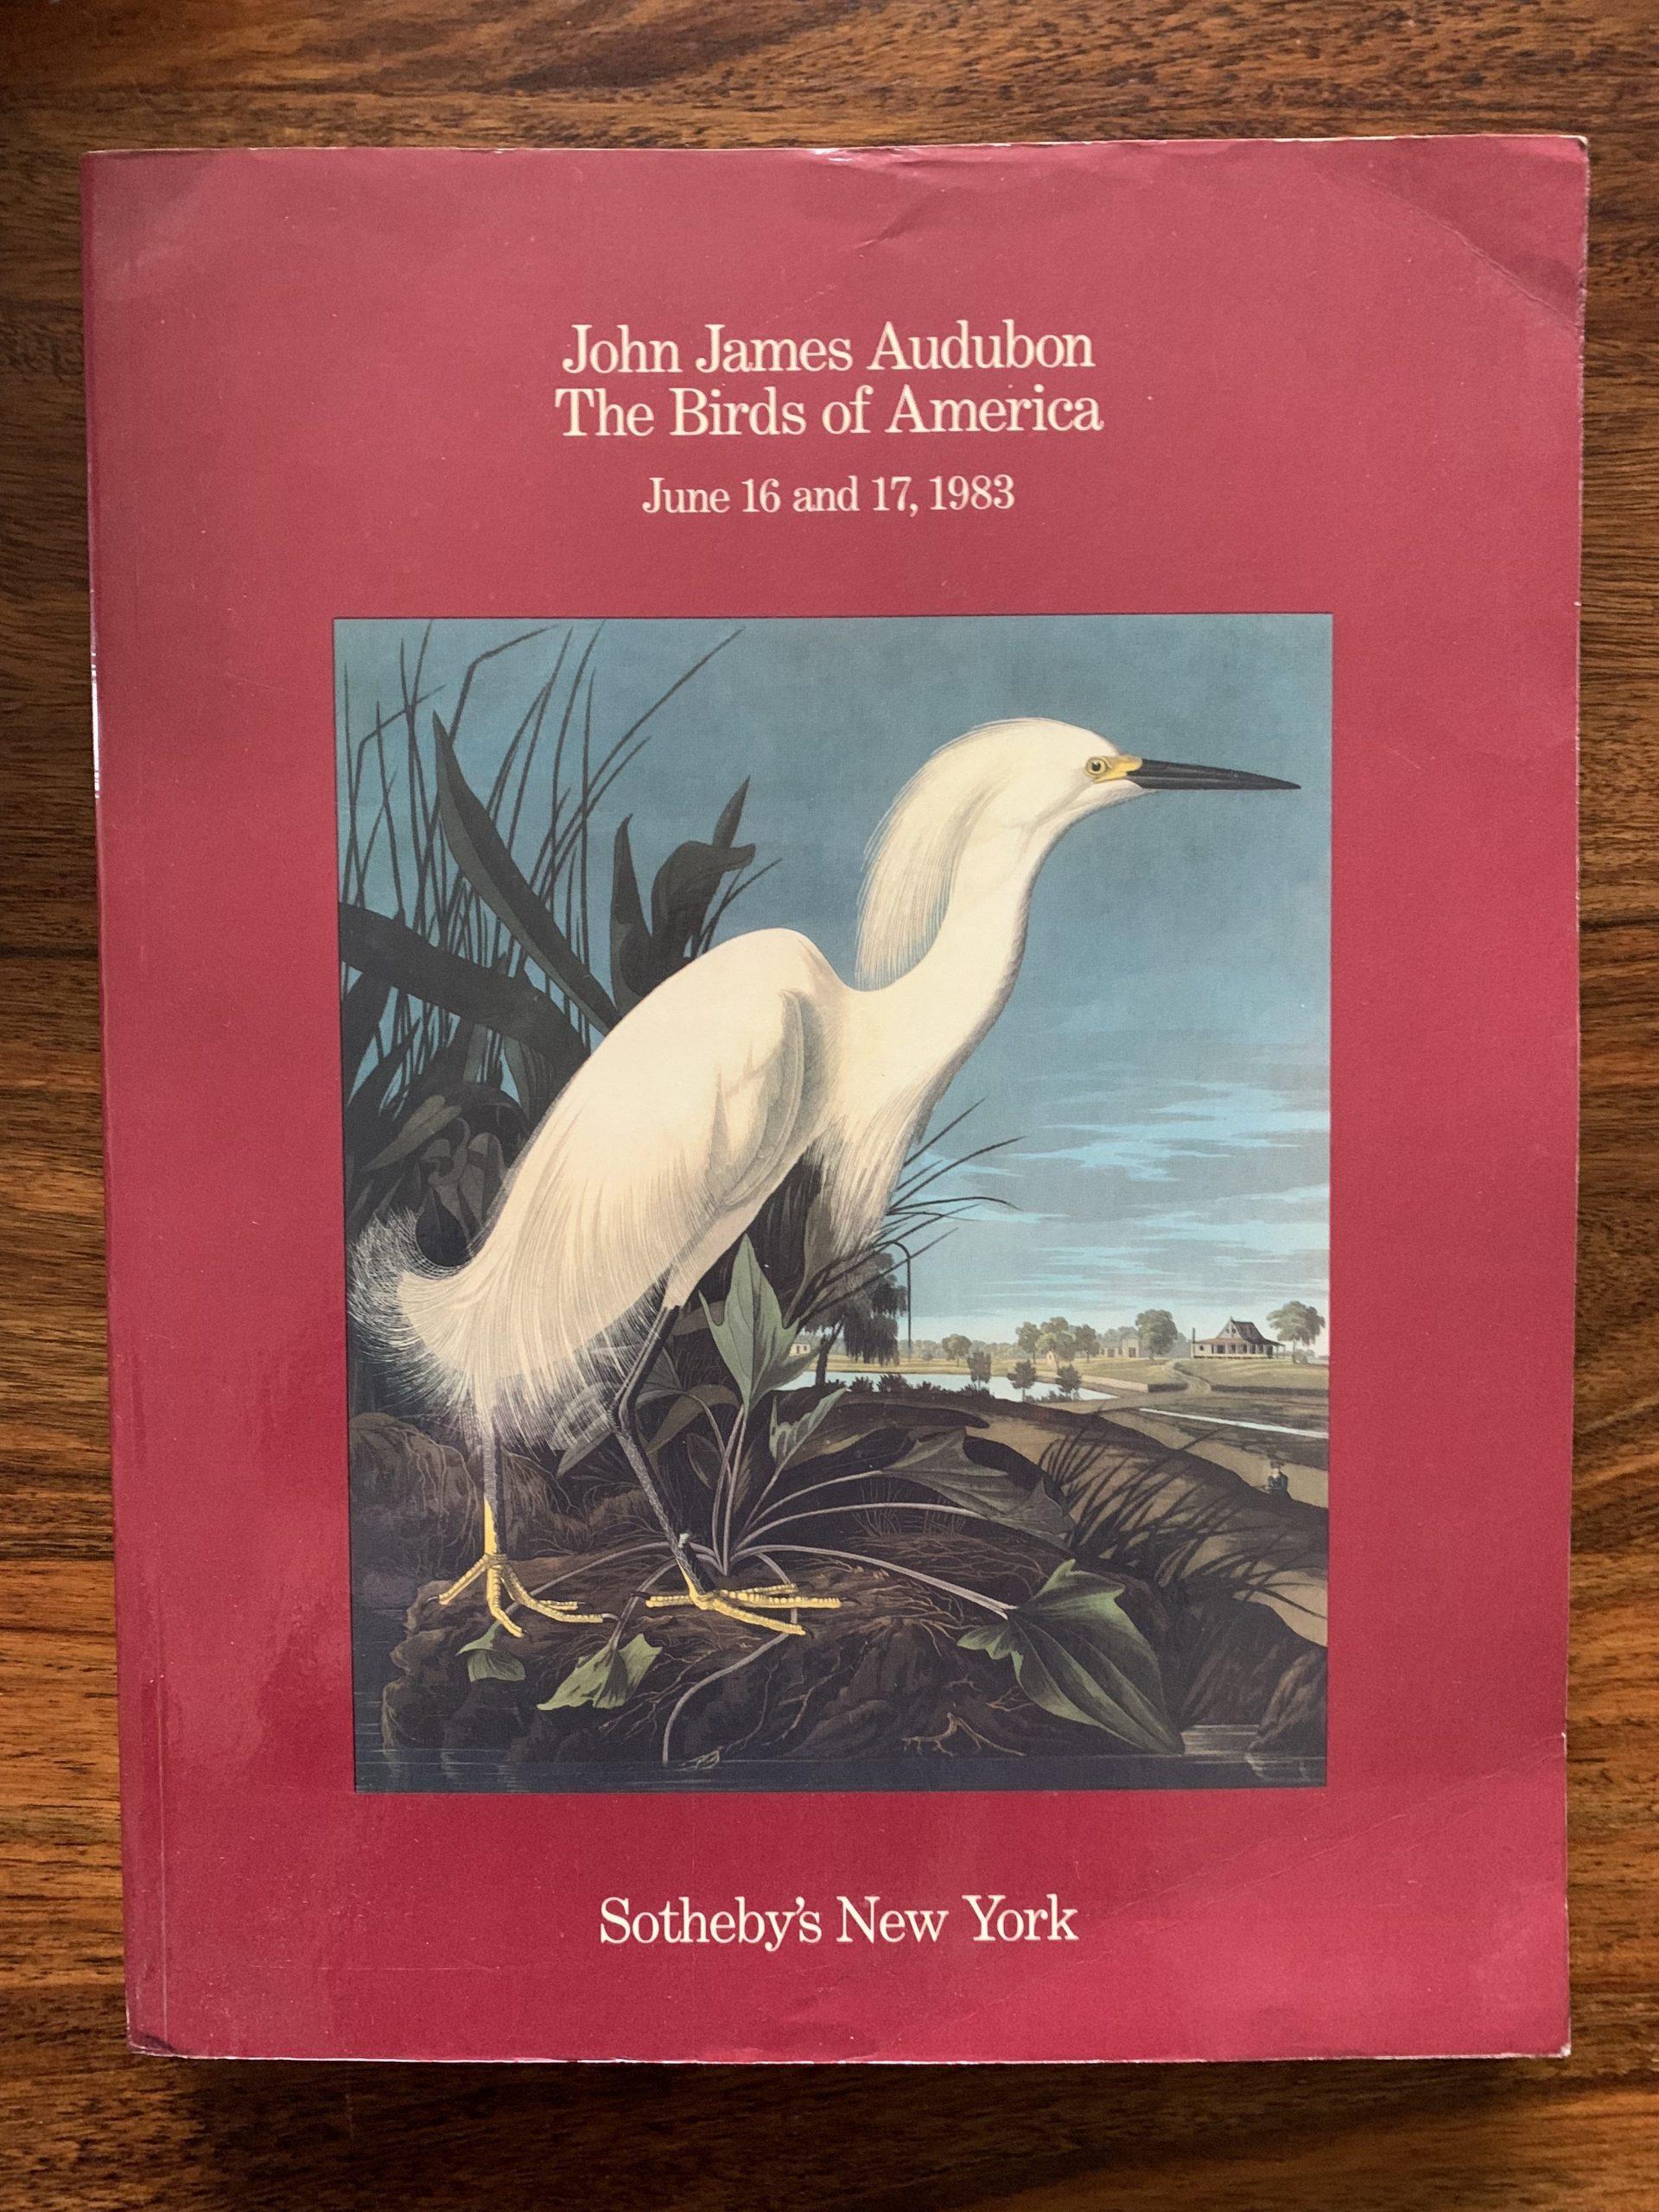 Sotheby's. John James Audubon The Birds Of America